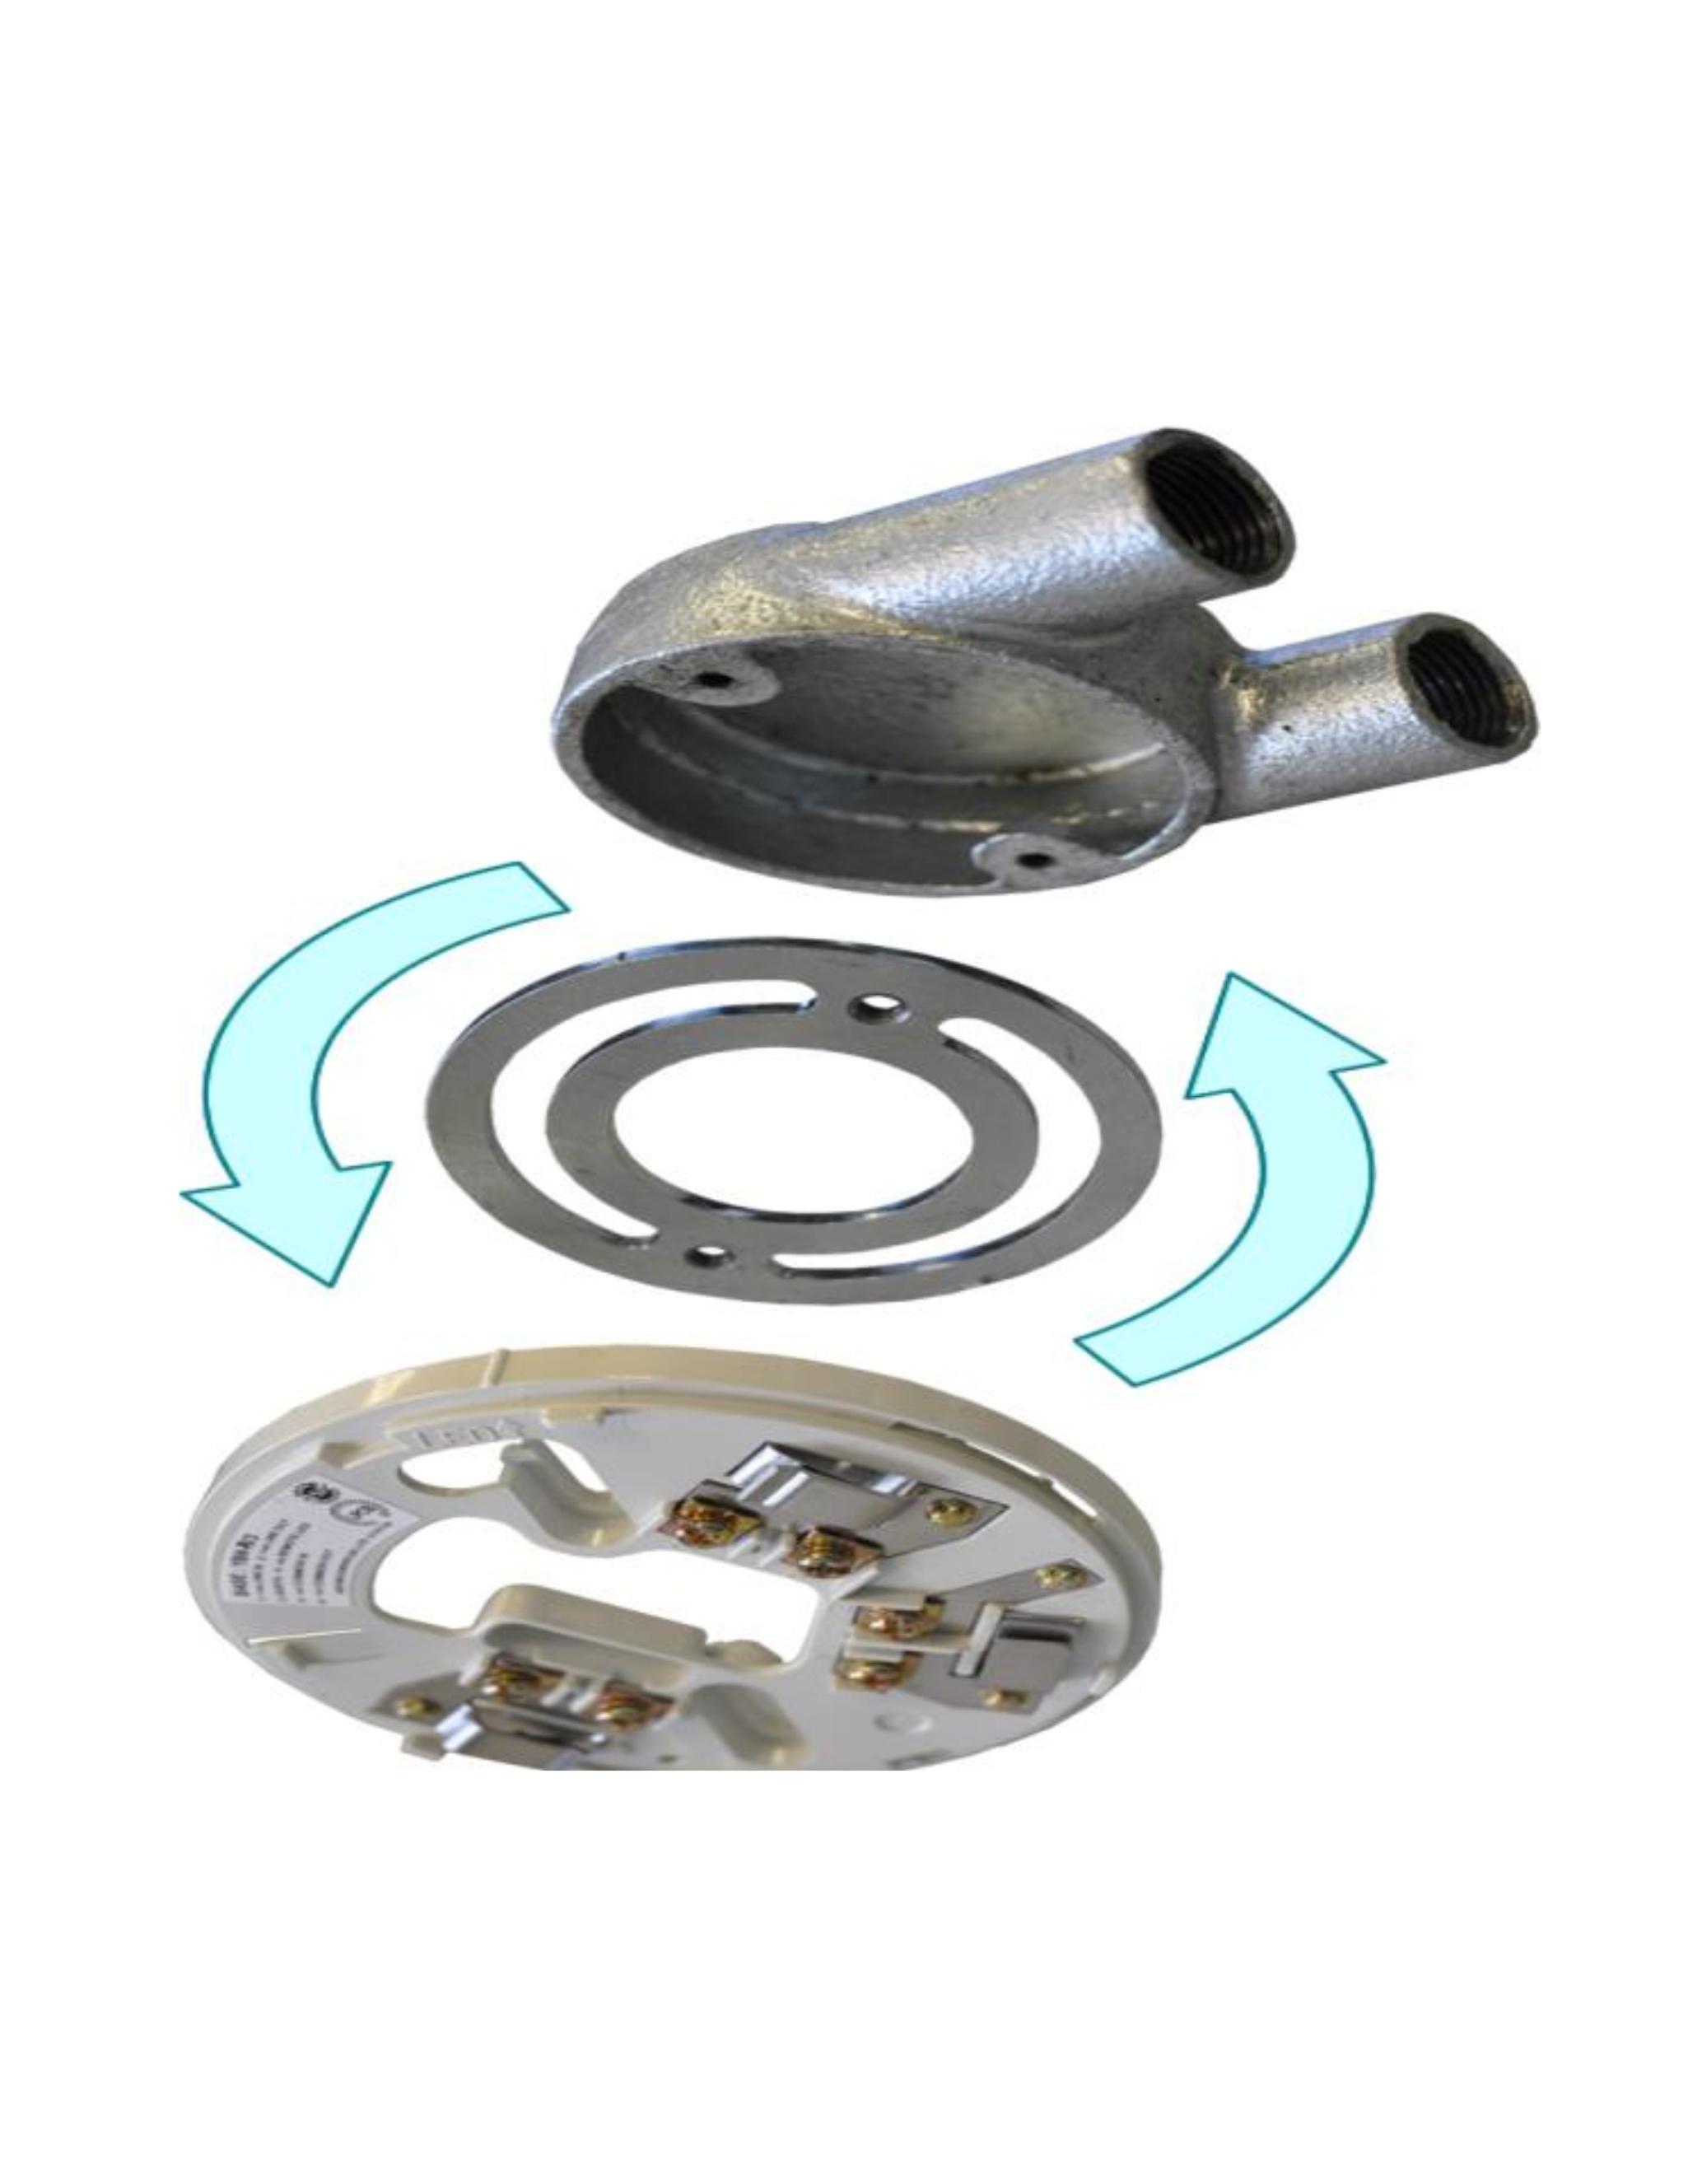 BESA Box Adaptor Plate 16701280-00